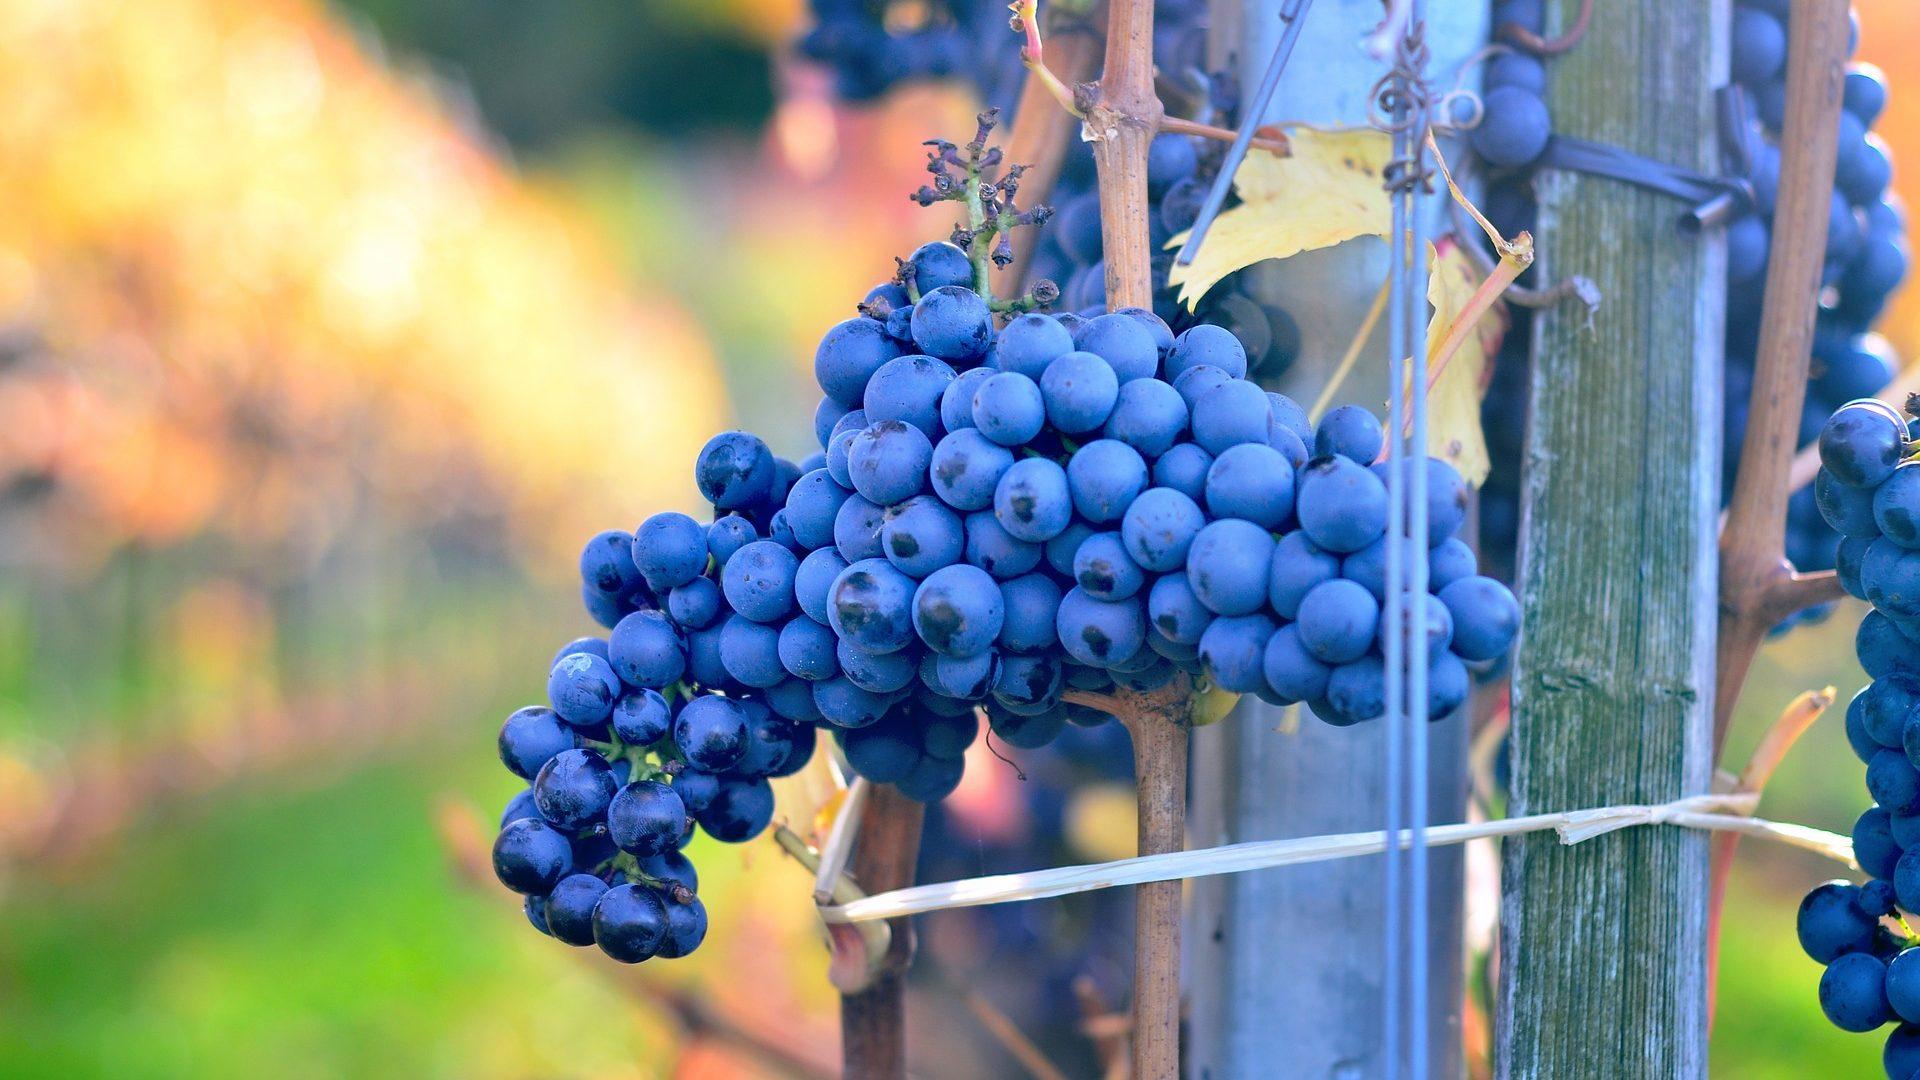 grapes-492584_1920